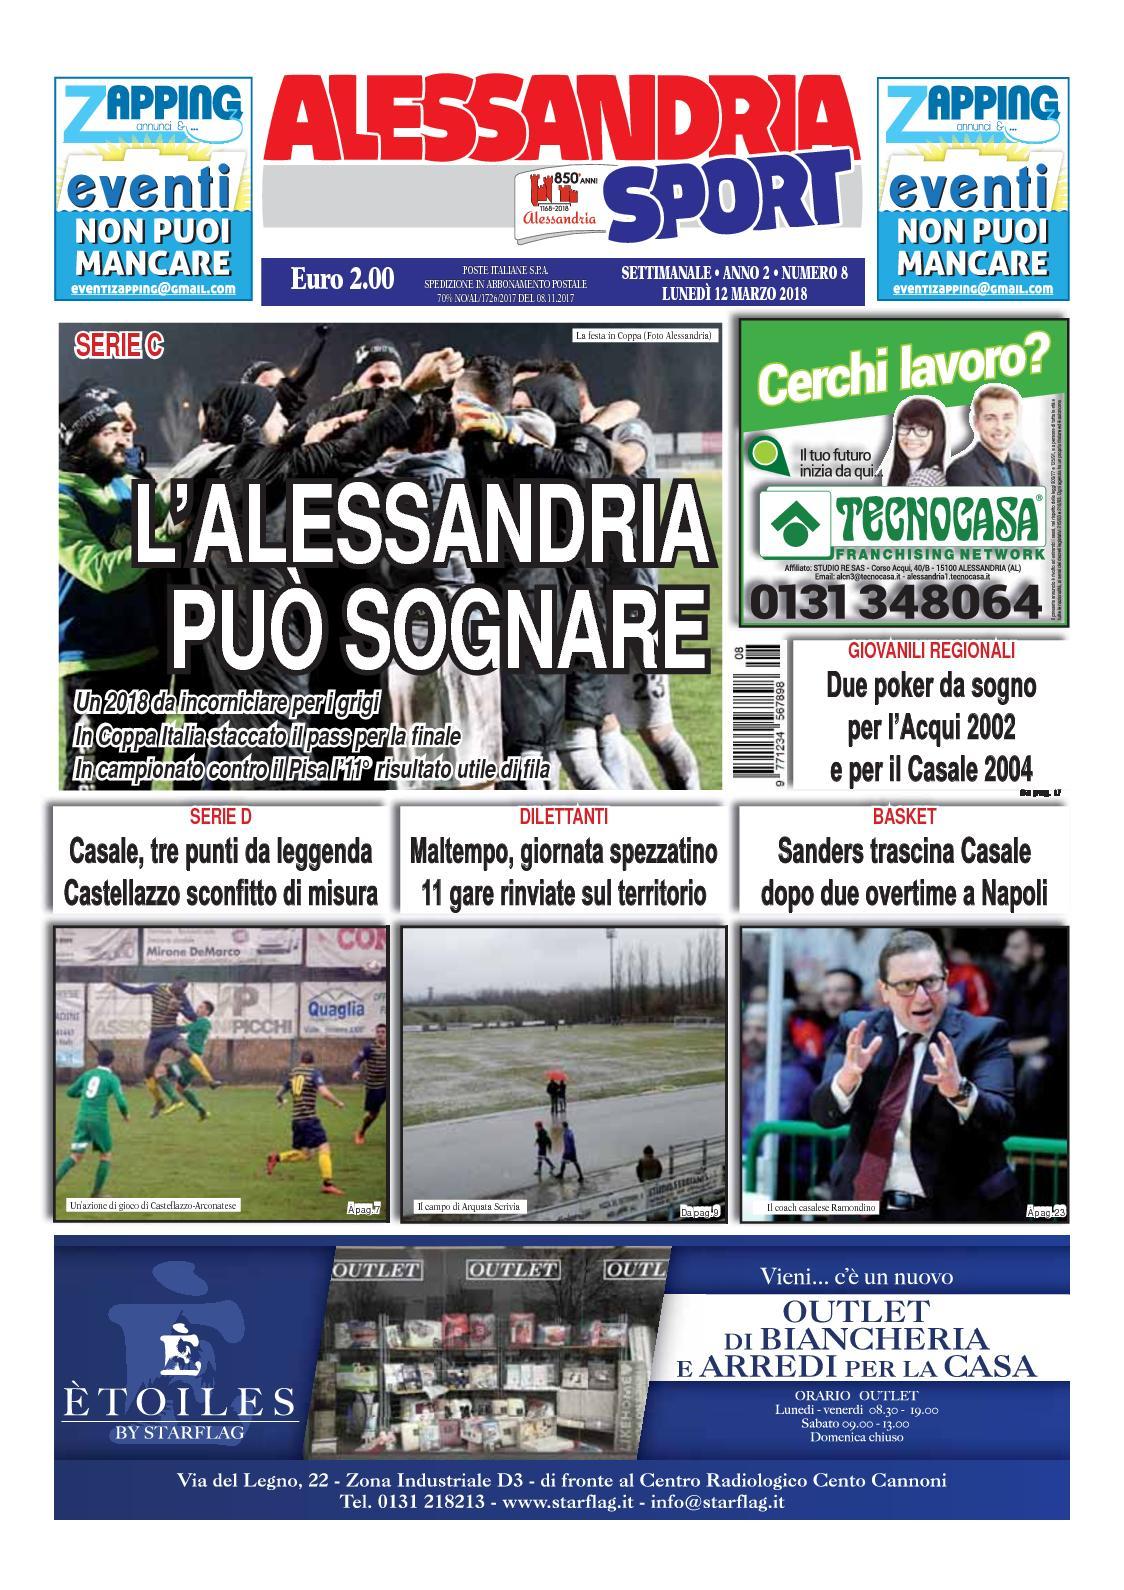 aa7a856b9 Calaméo - 2018 Alessandria Sport 08